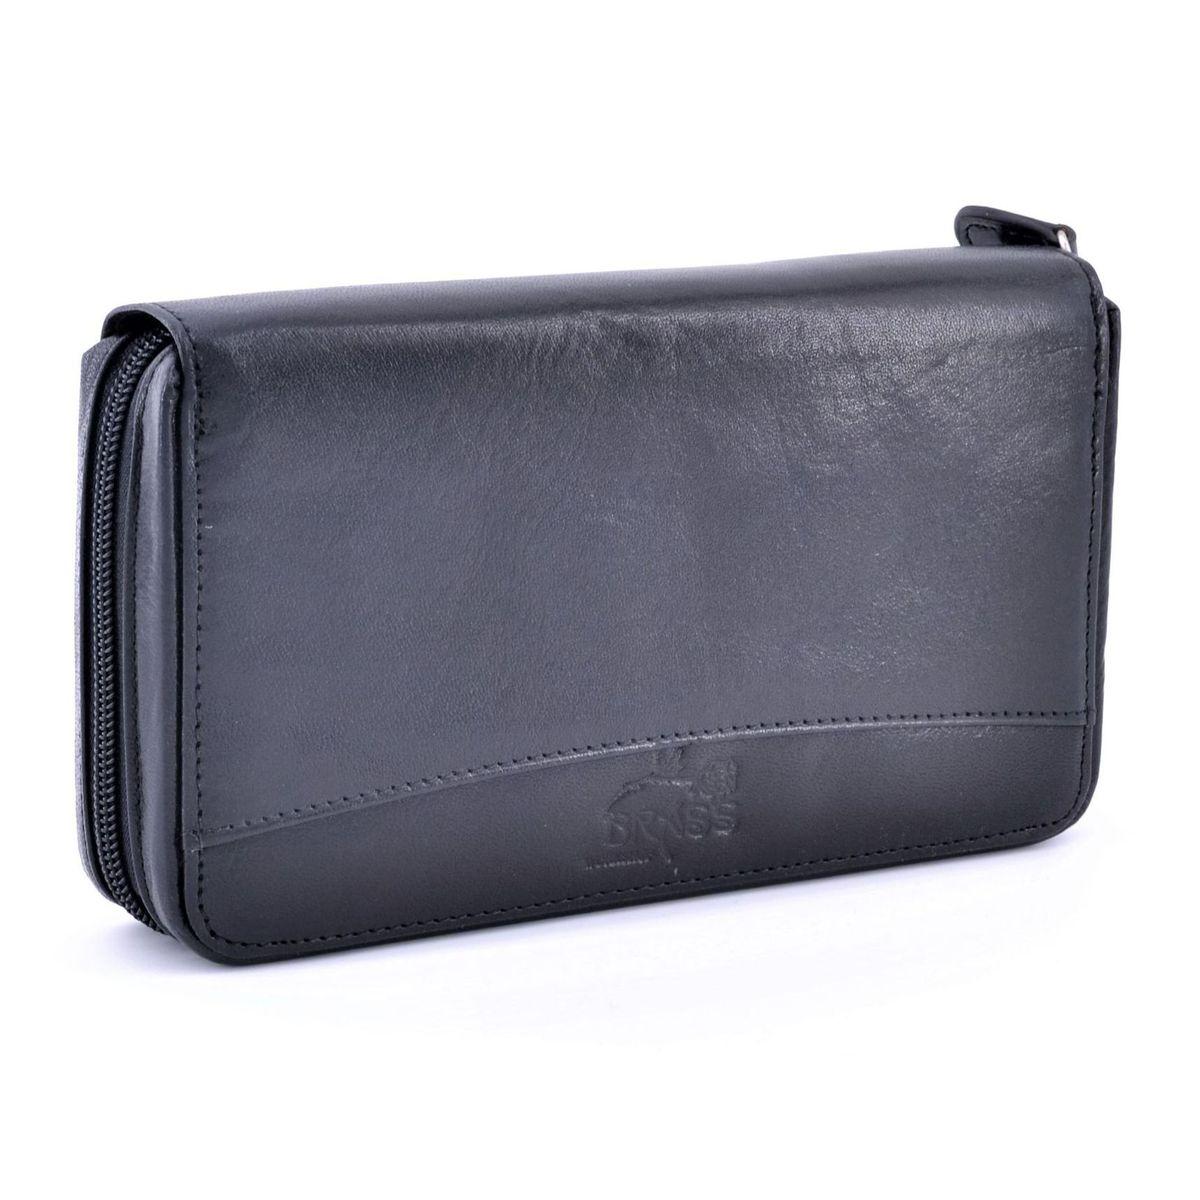 Max women's leather wallet Black BRASS Workshop